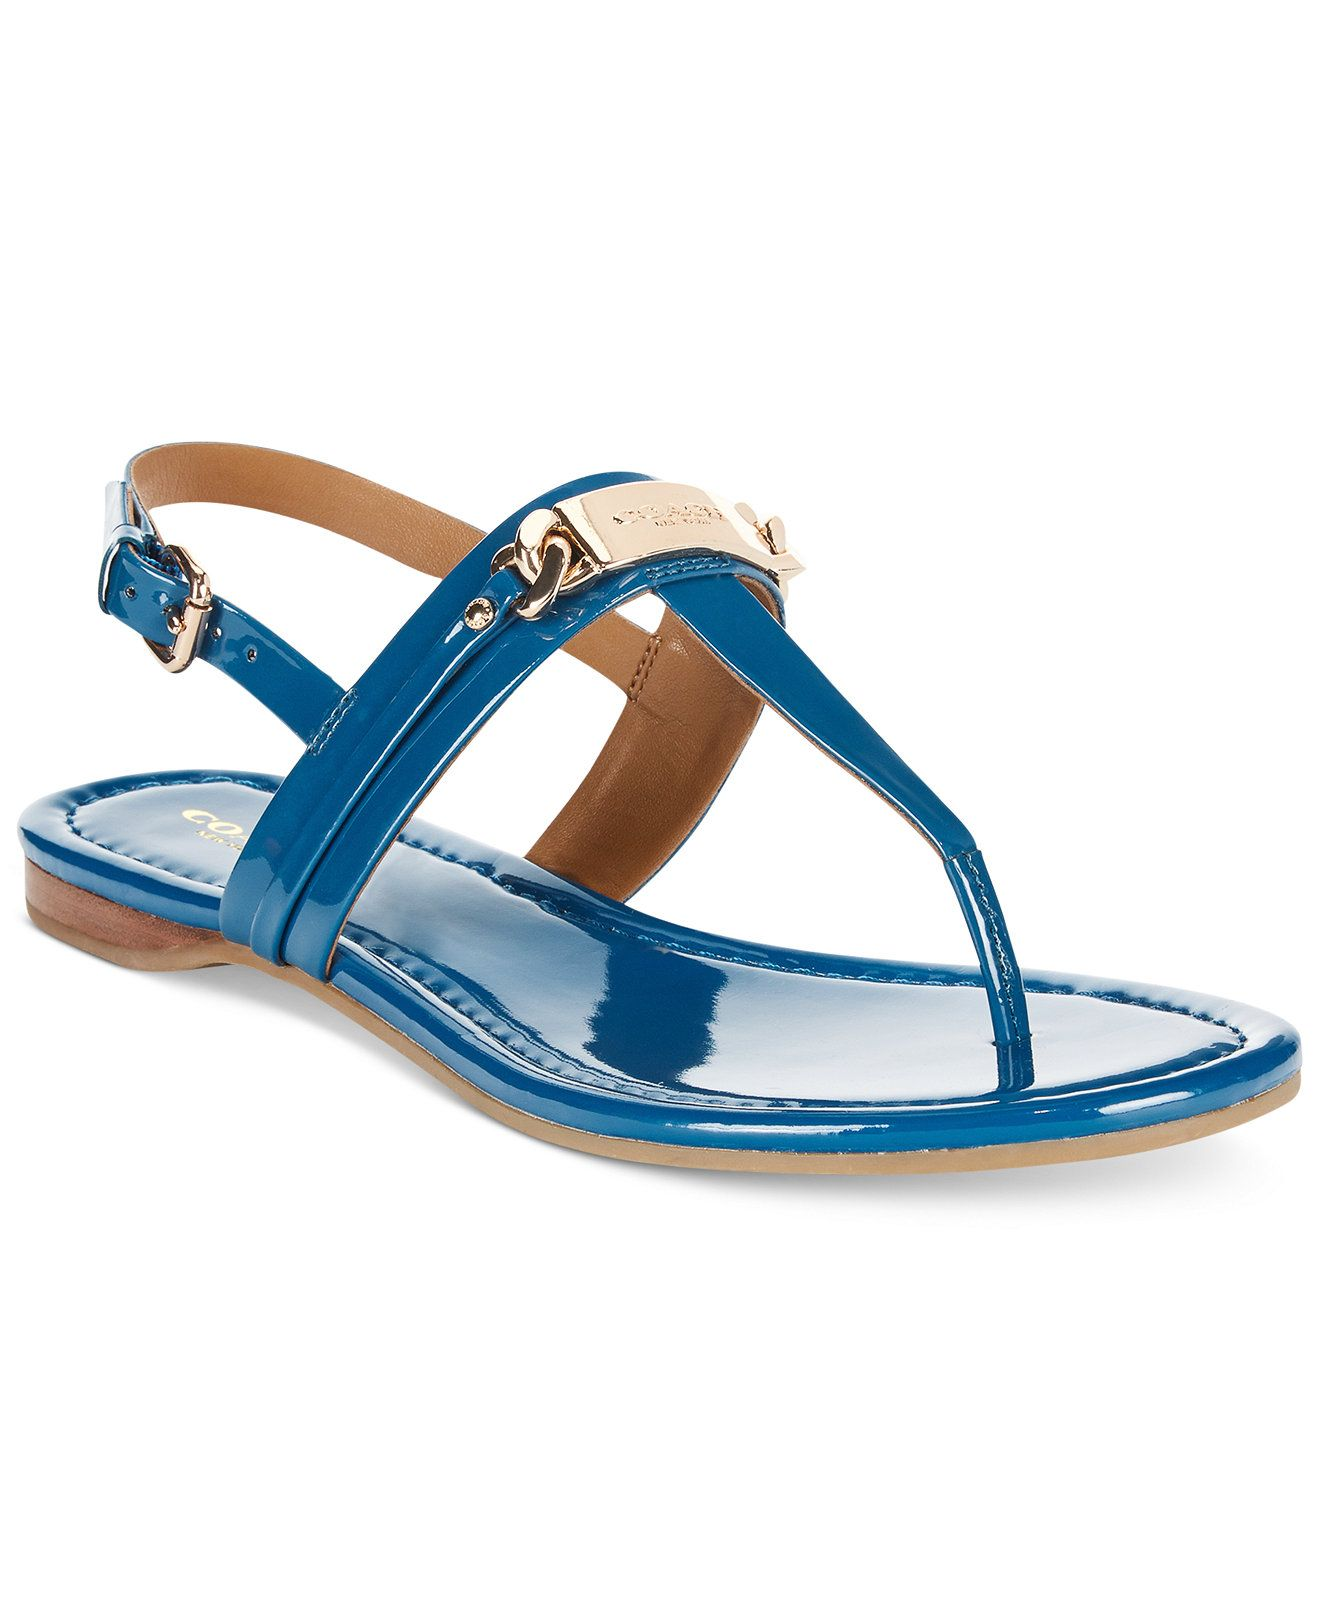 c16744c65a72 COACH Caterine Logo Hardware Flat Sandals - Coach Shoes - Handbags    Accessories - Macy s